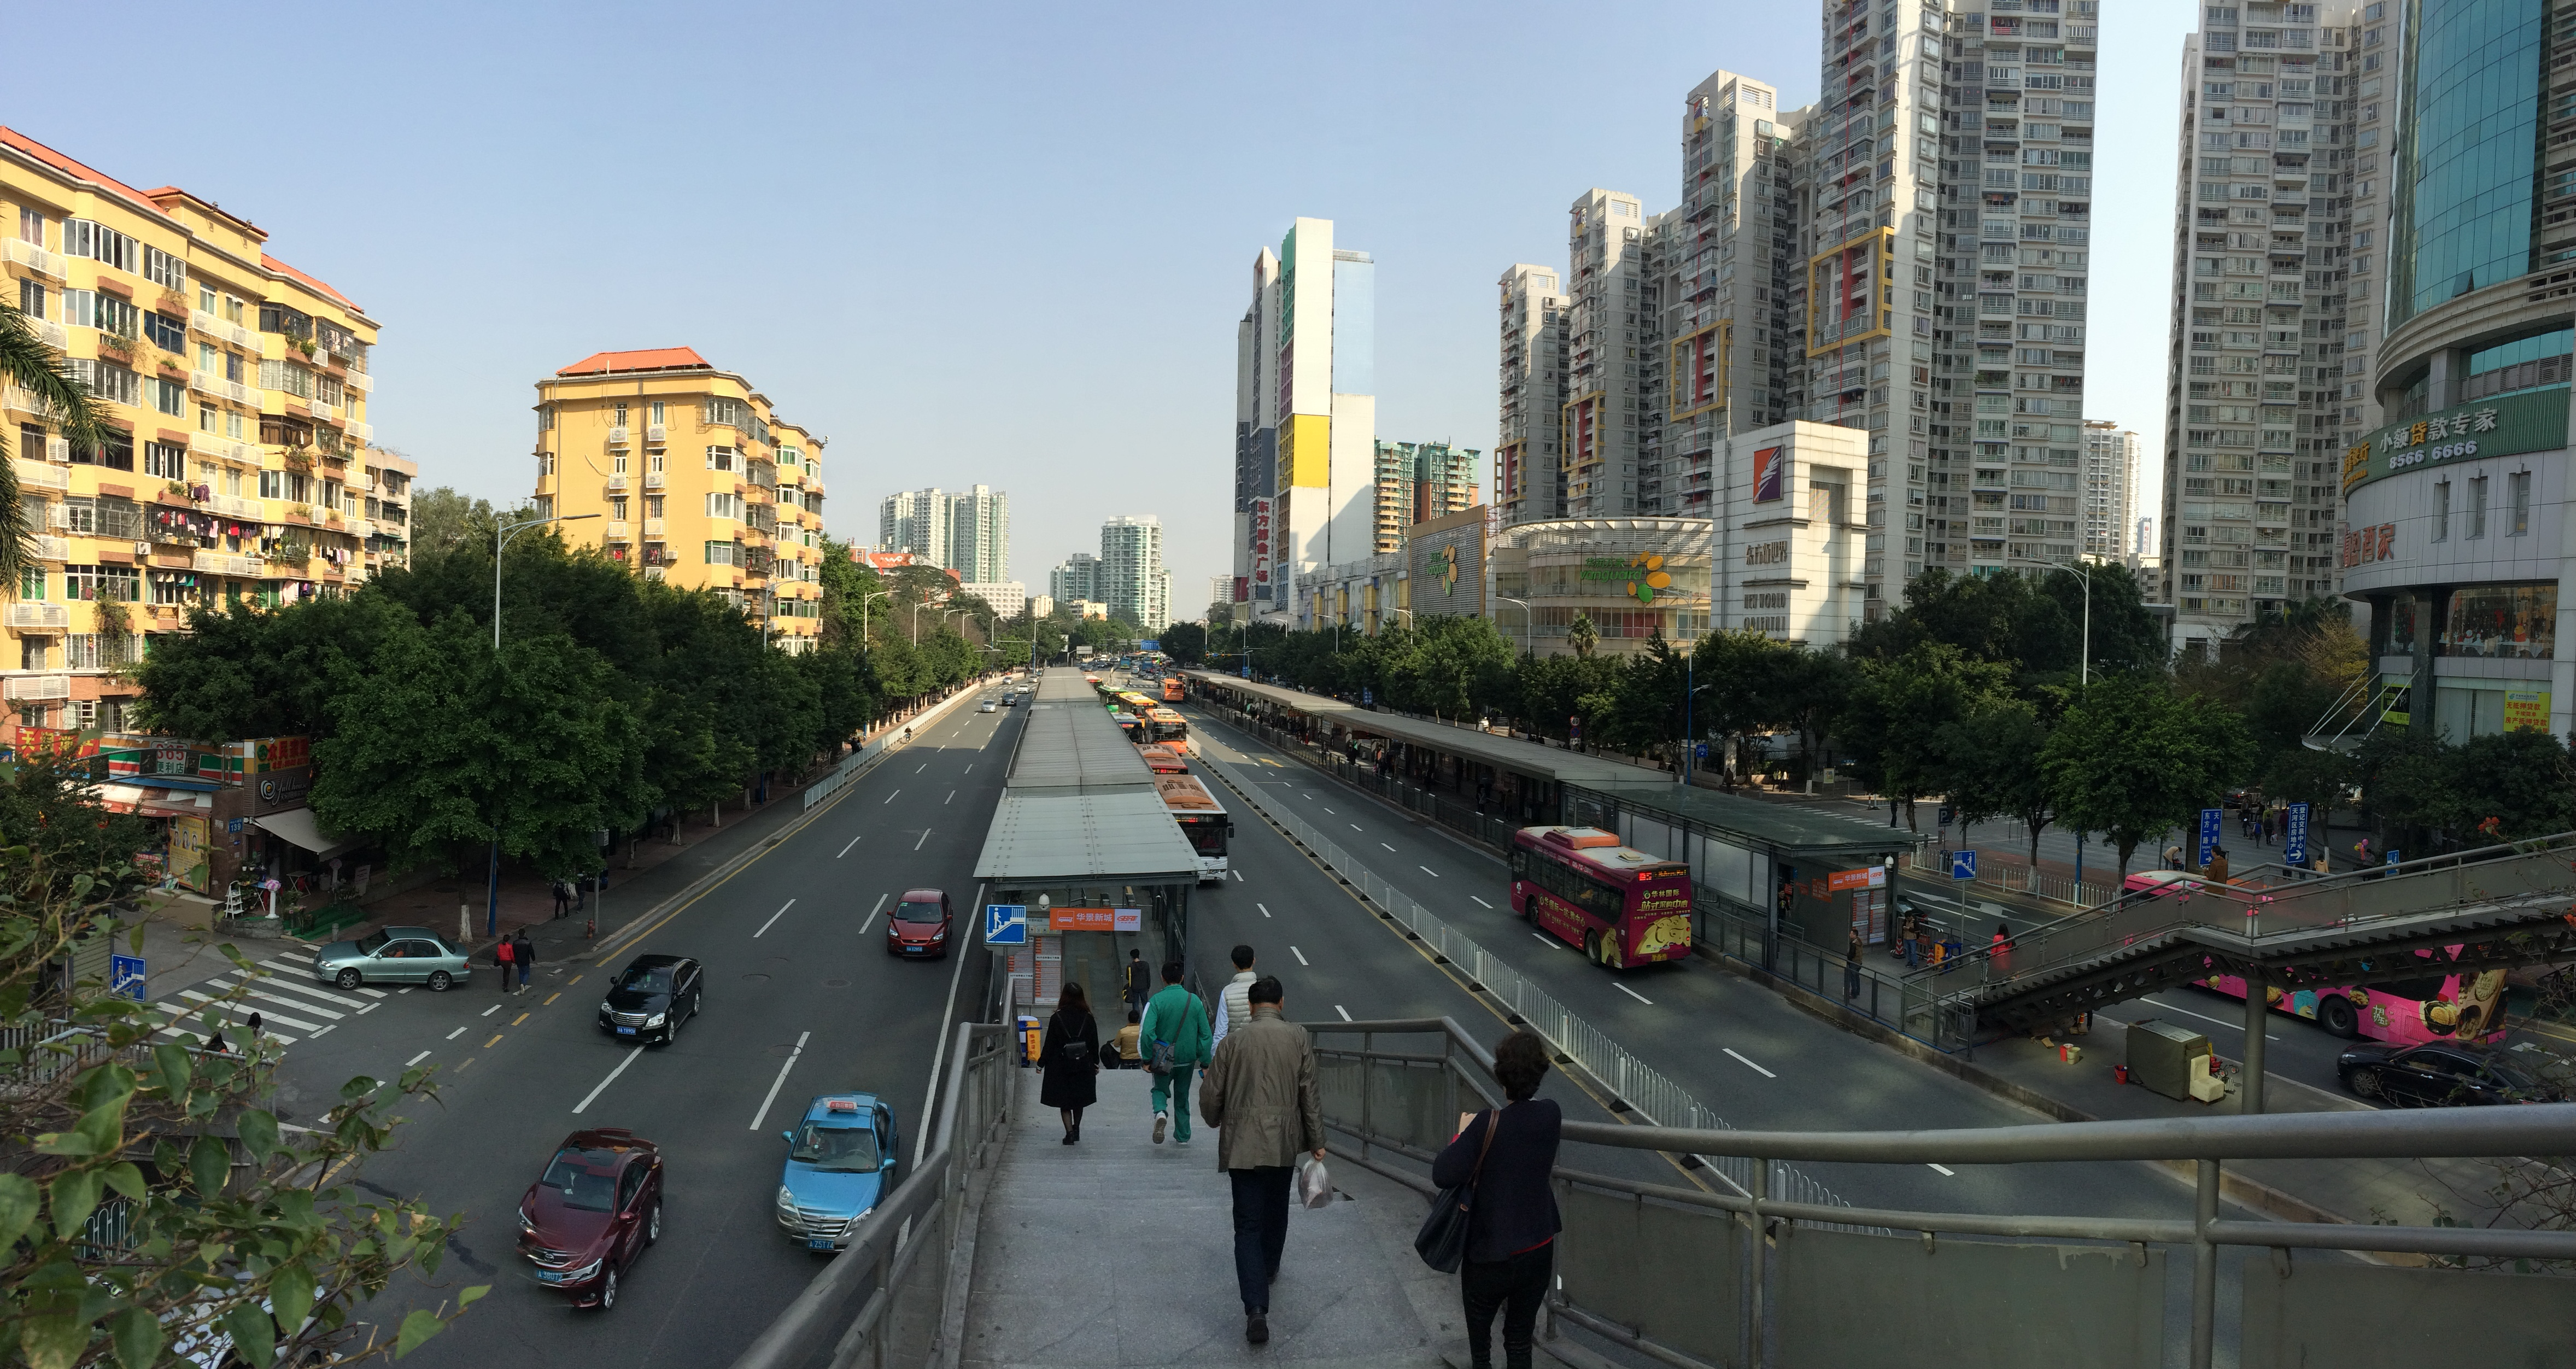 Tianhe Park, Tianhe, Guangzhou, Guangdong, China - panoramio.jpg